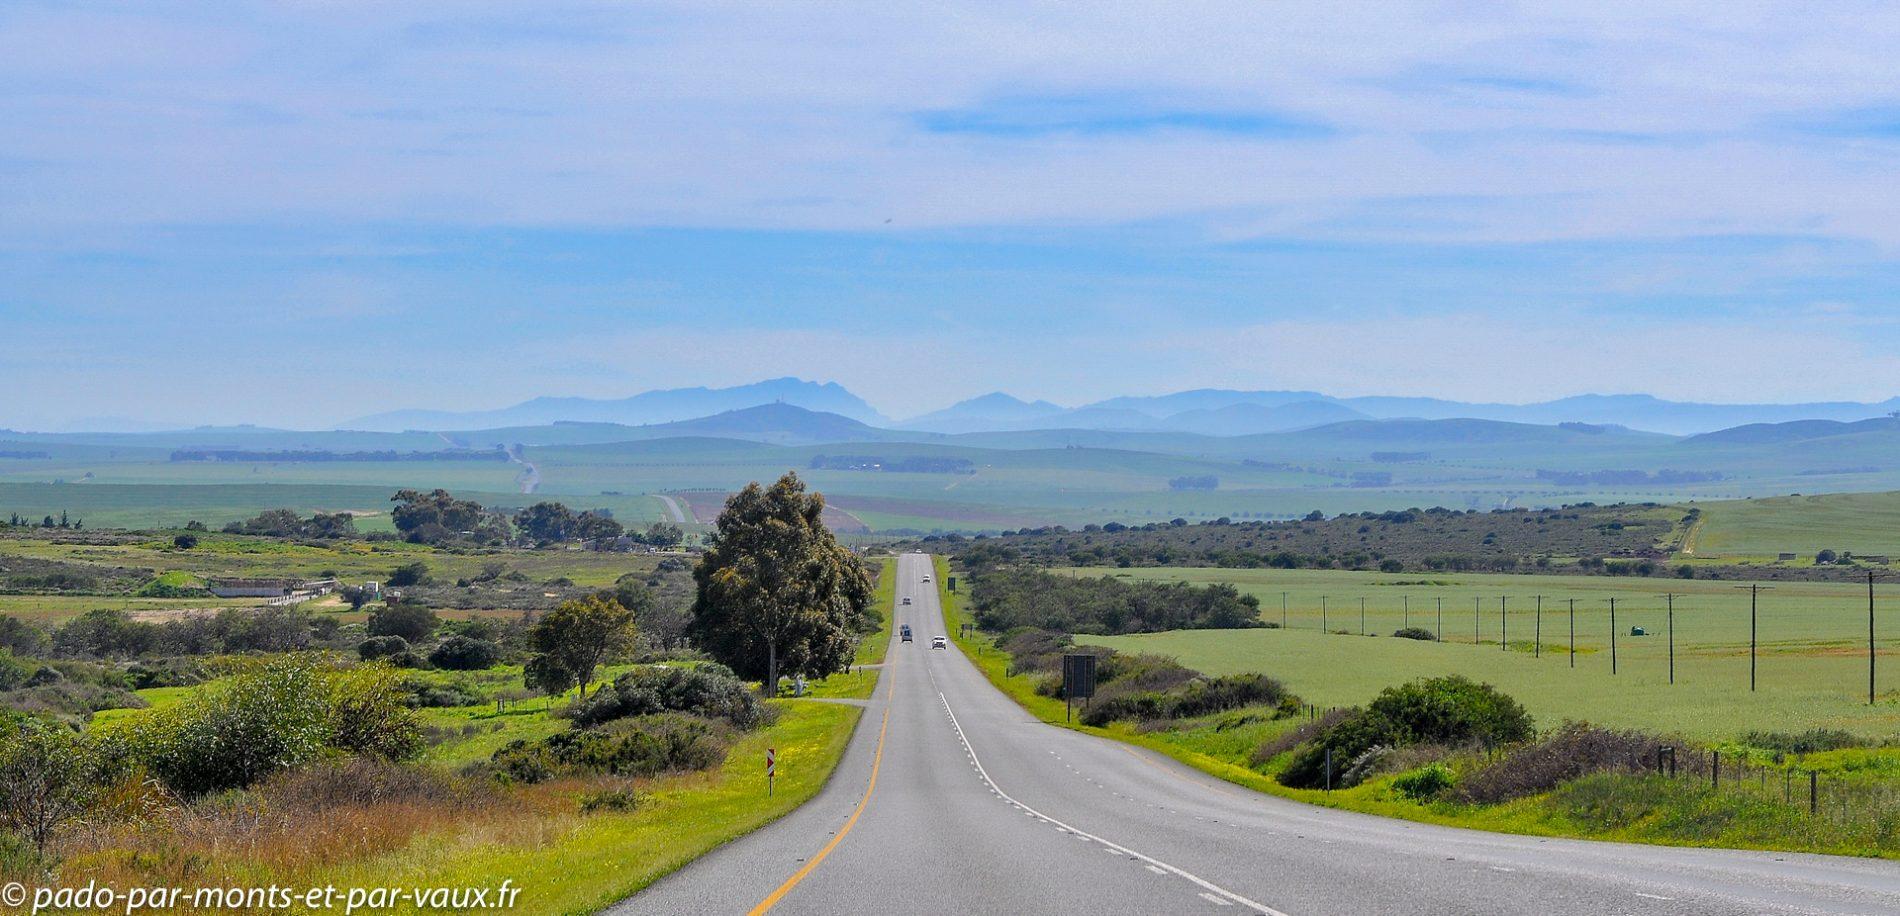 N7 Cape Town - Clanwilliam